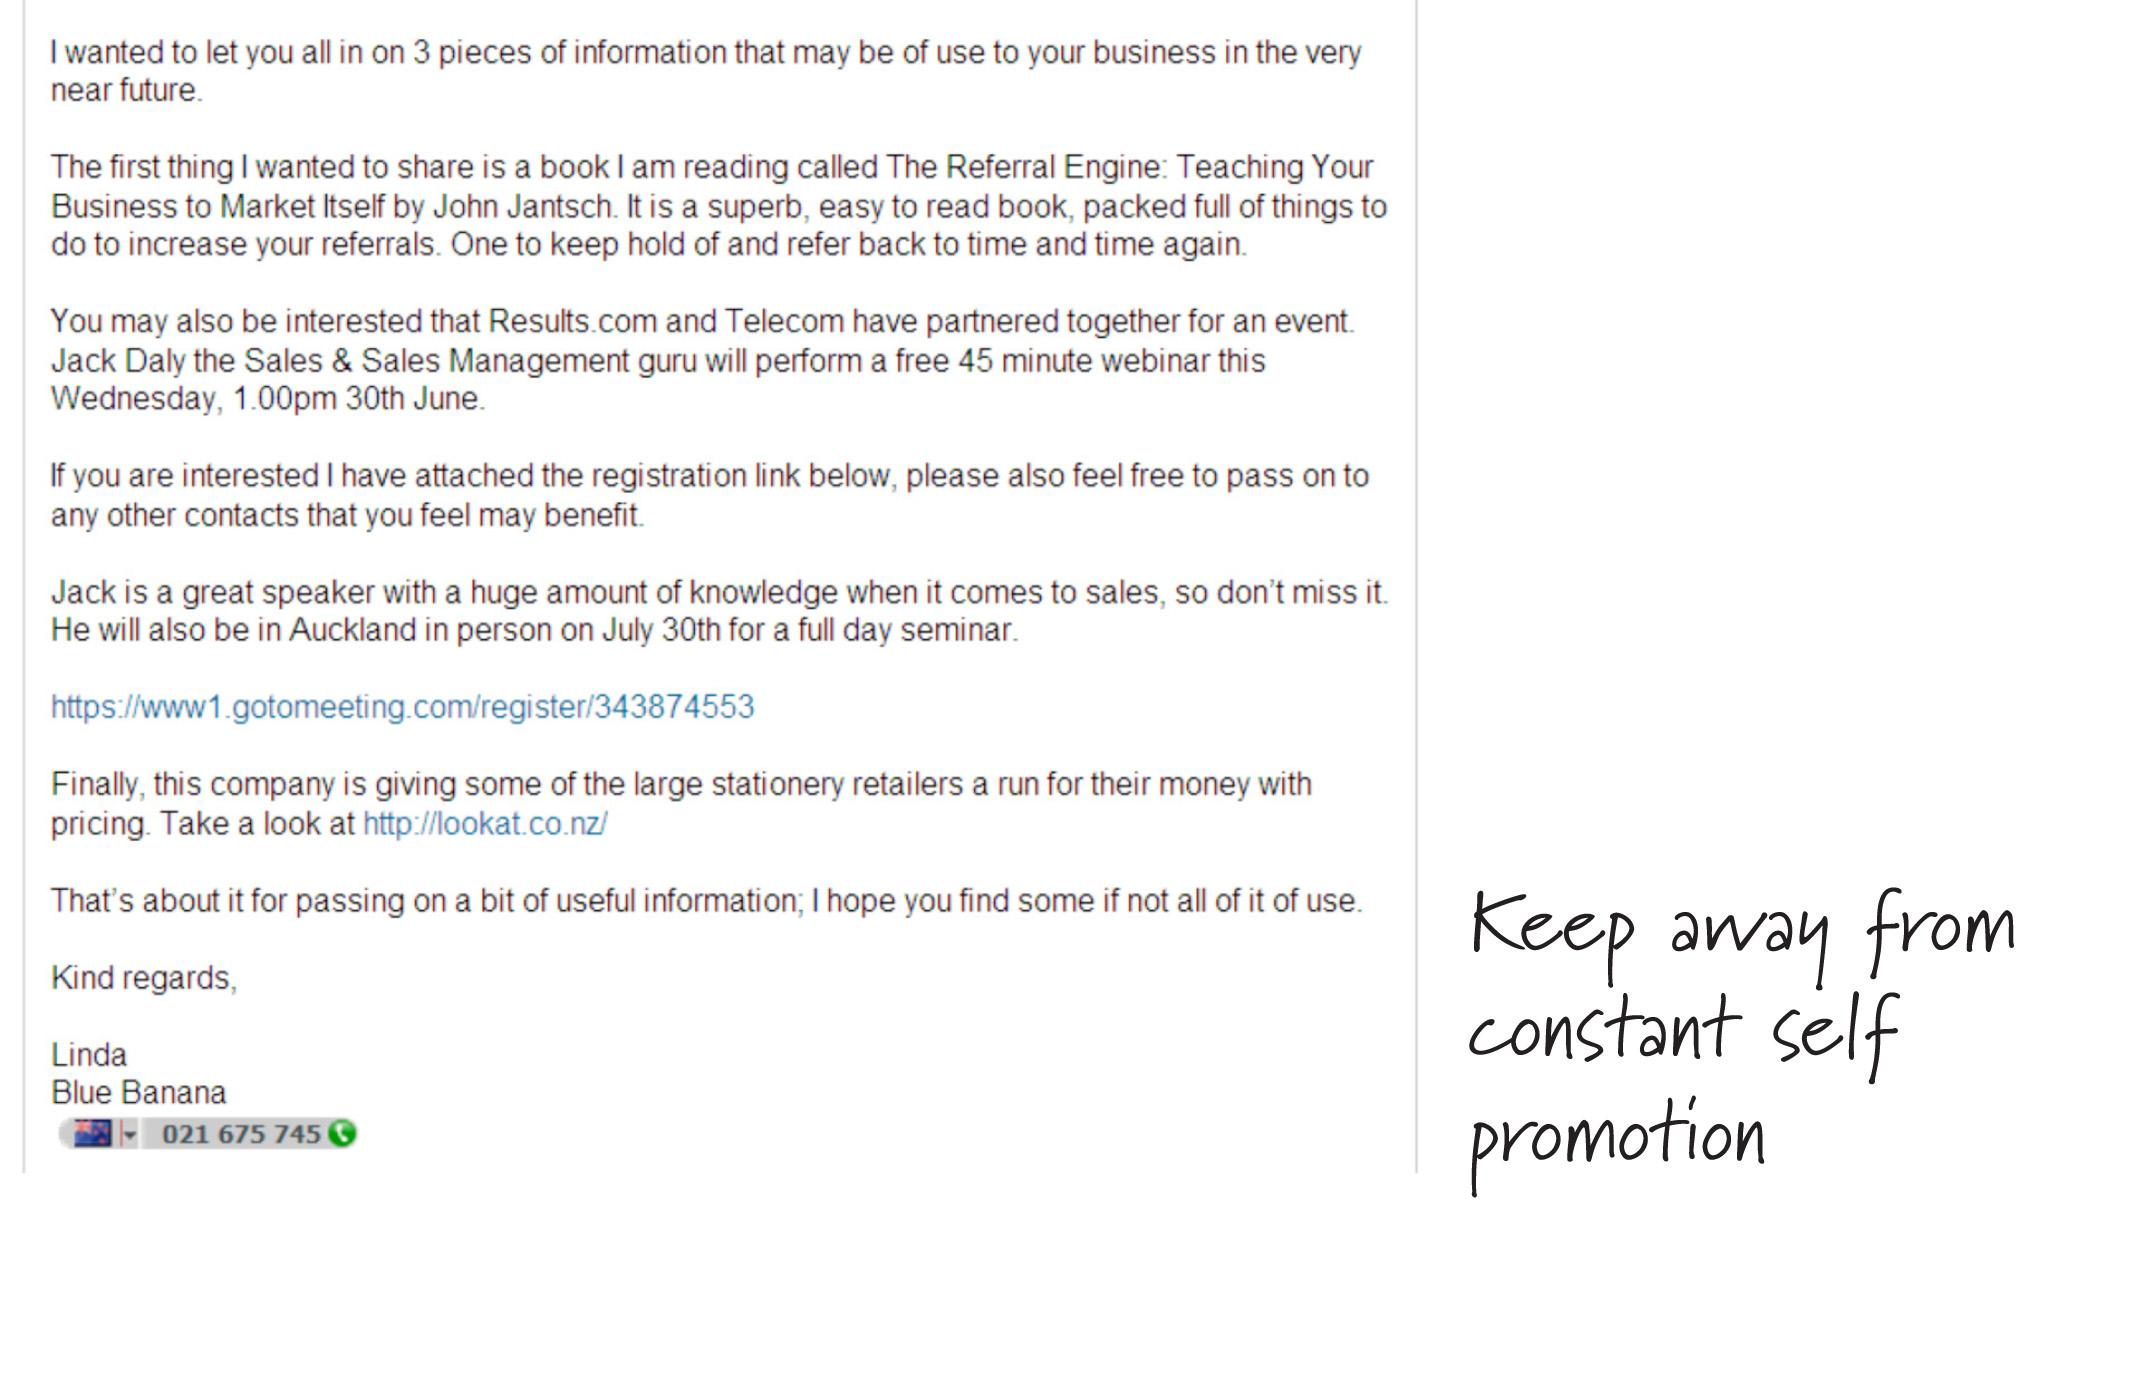 Linkedin Re mendation Template 14 re mendation letter